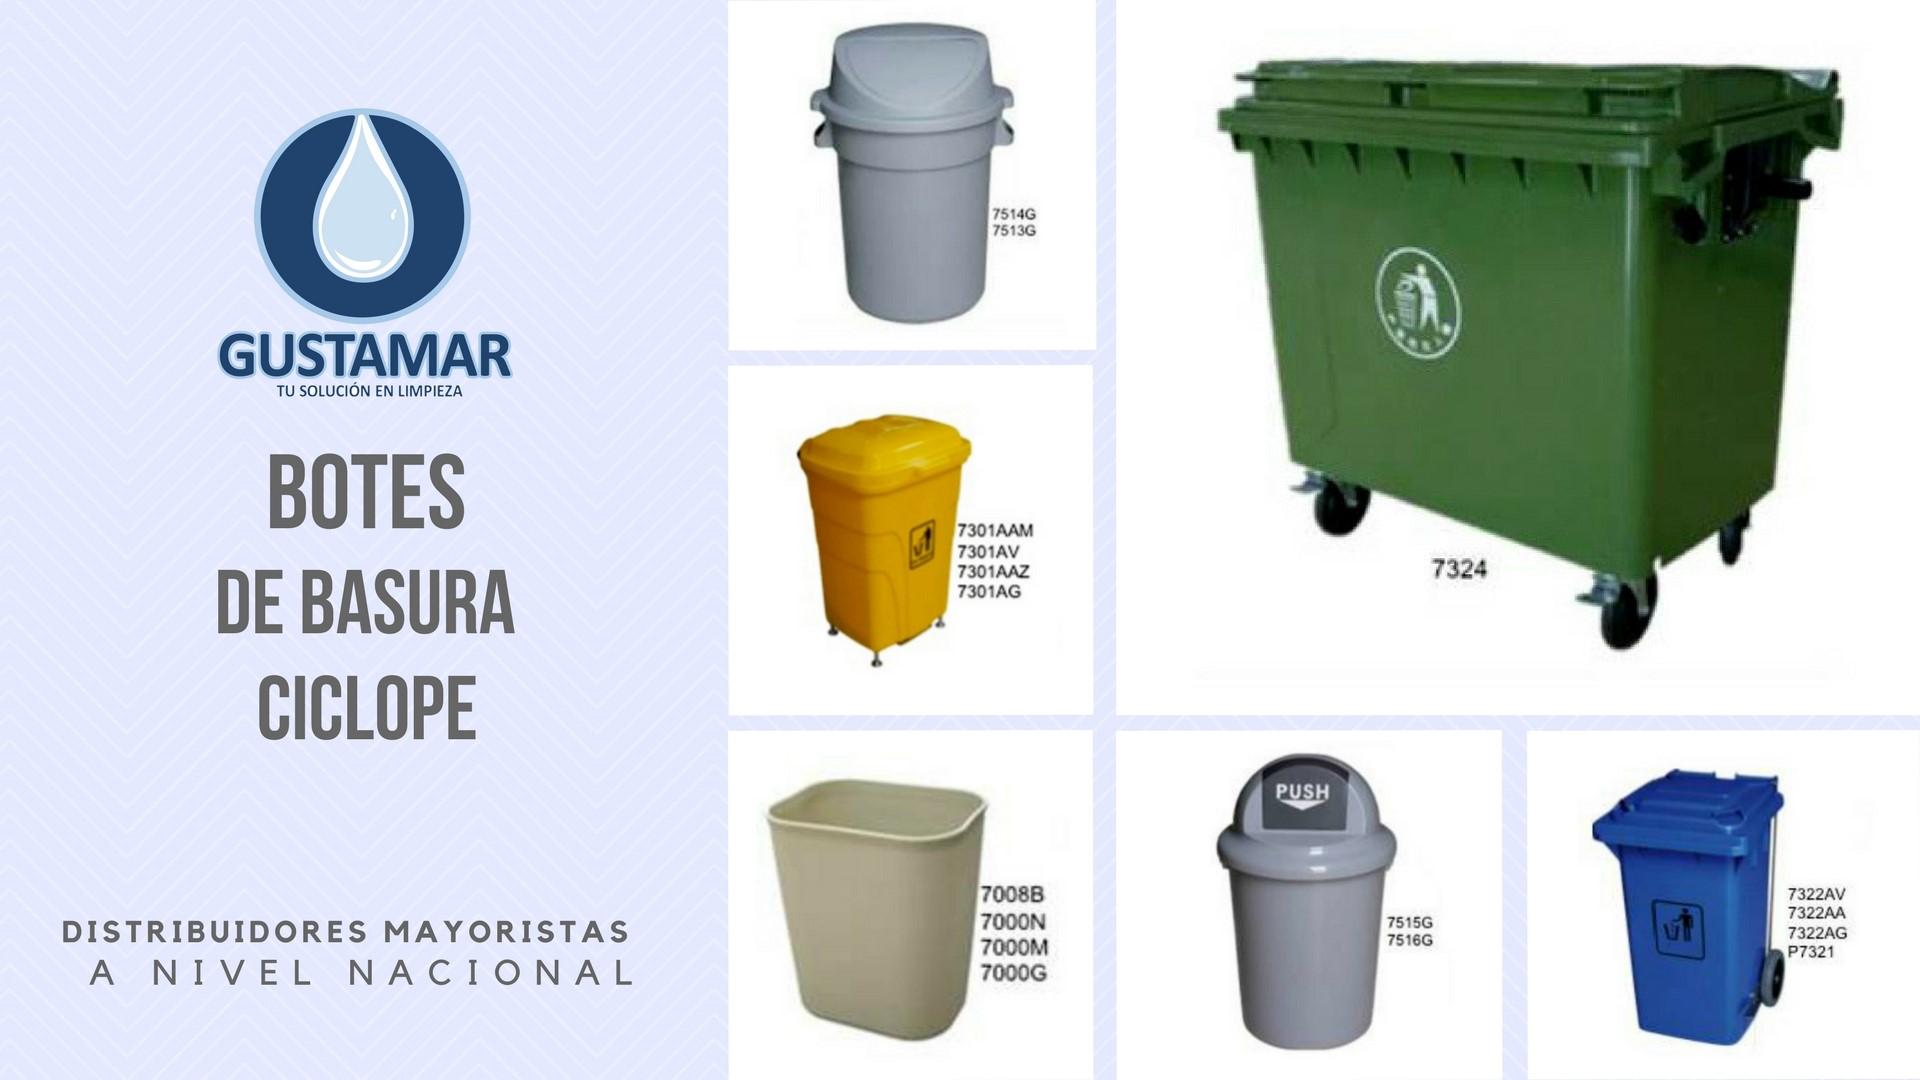 BOTES DE BASURA / BASUREROS CÍCLOPE